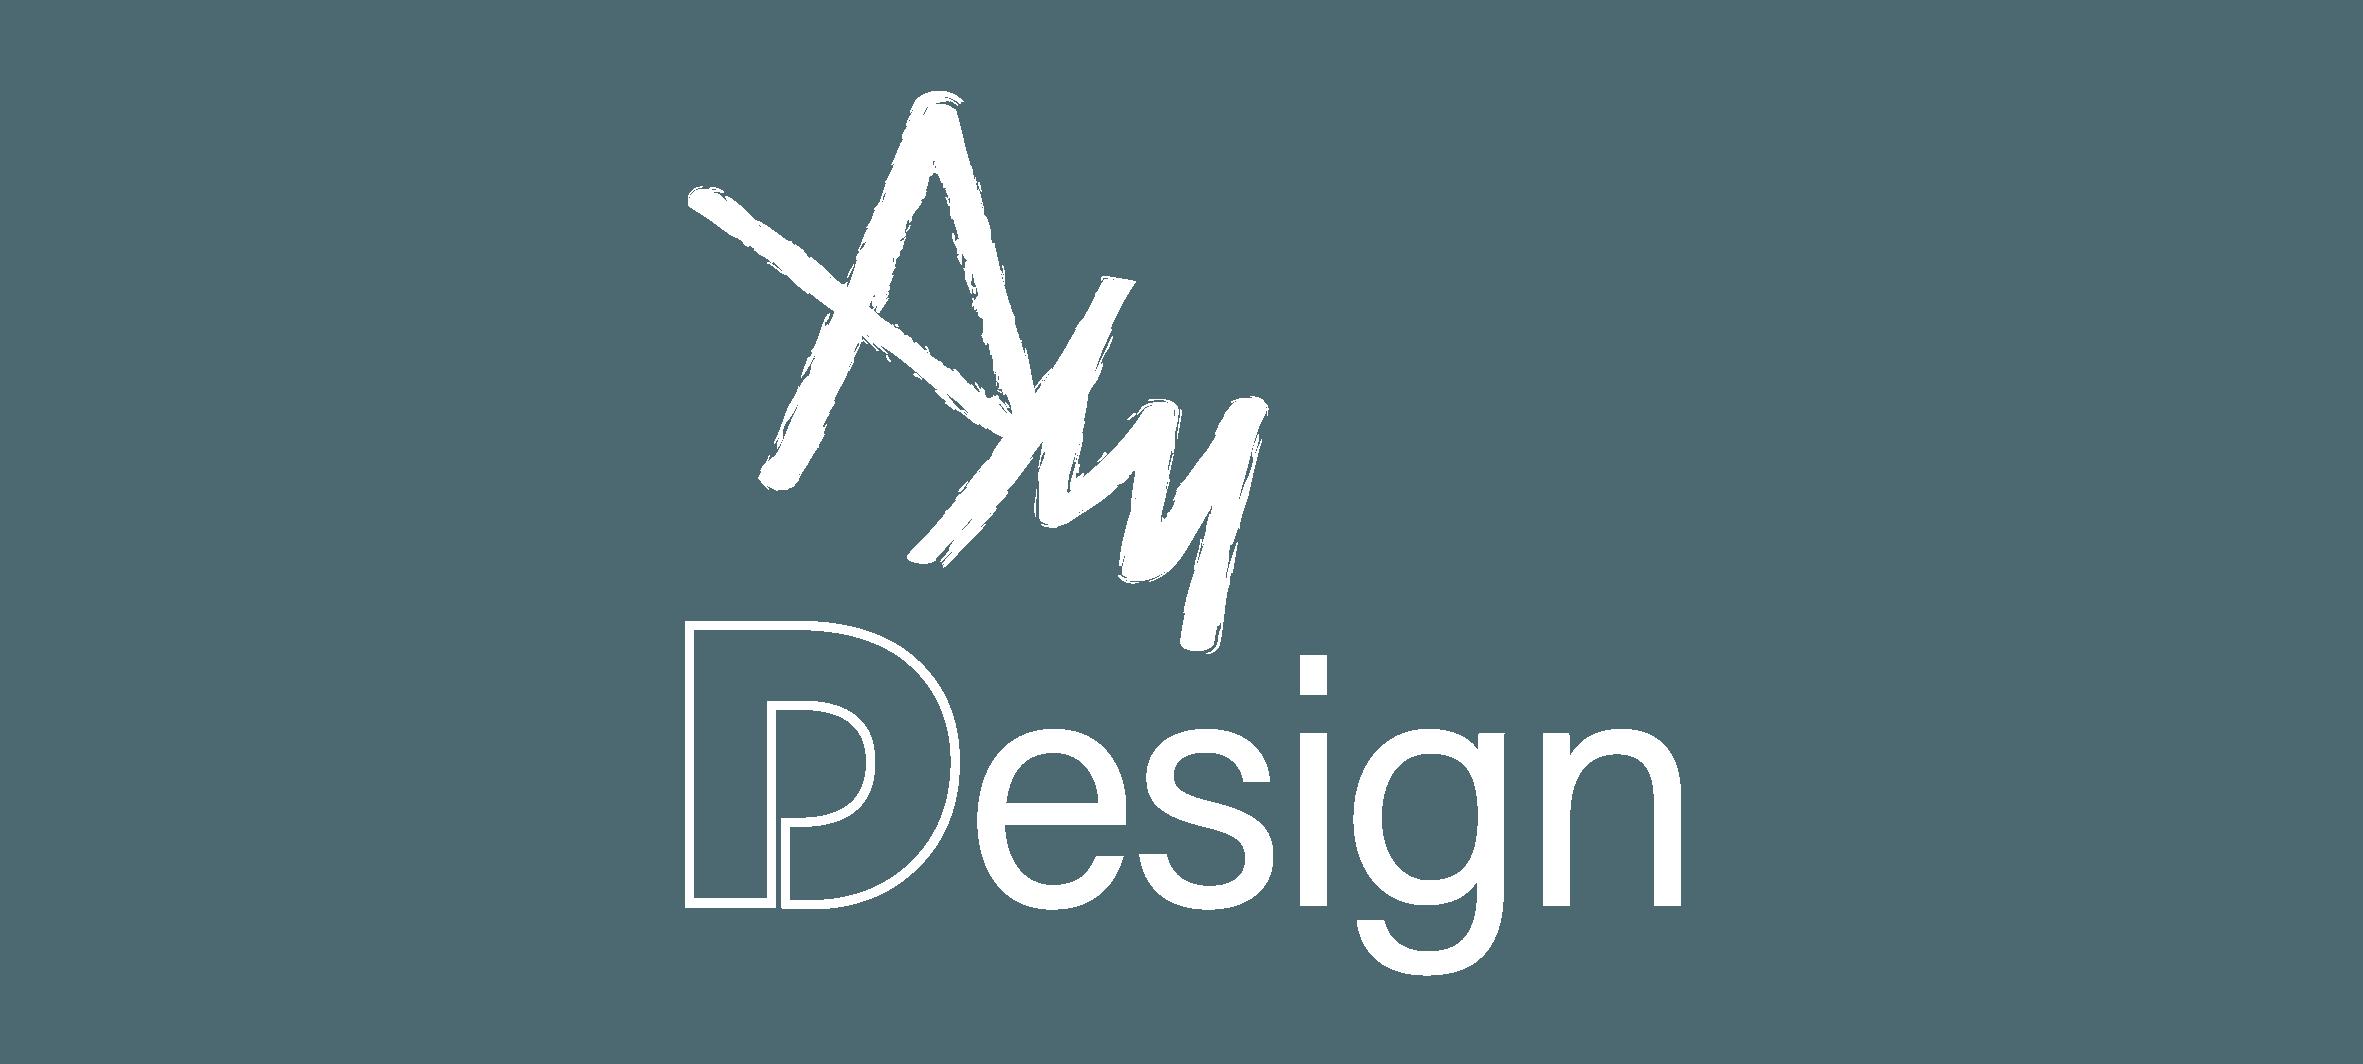 AM Design Sassuolo